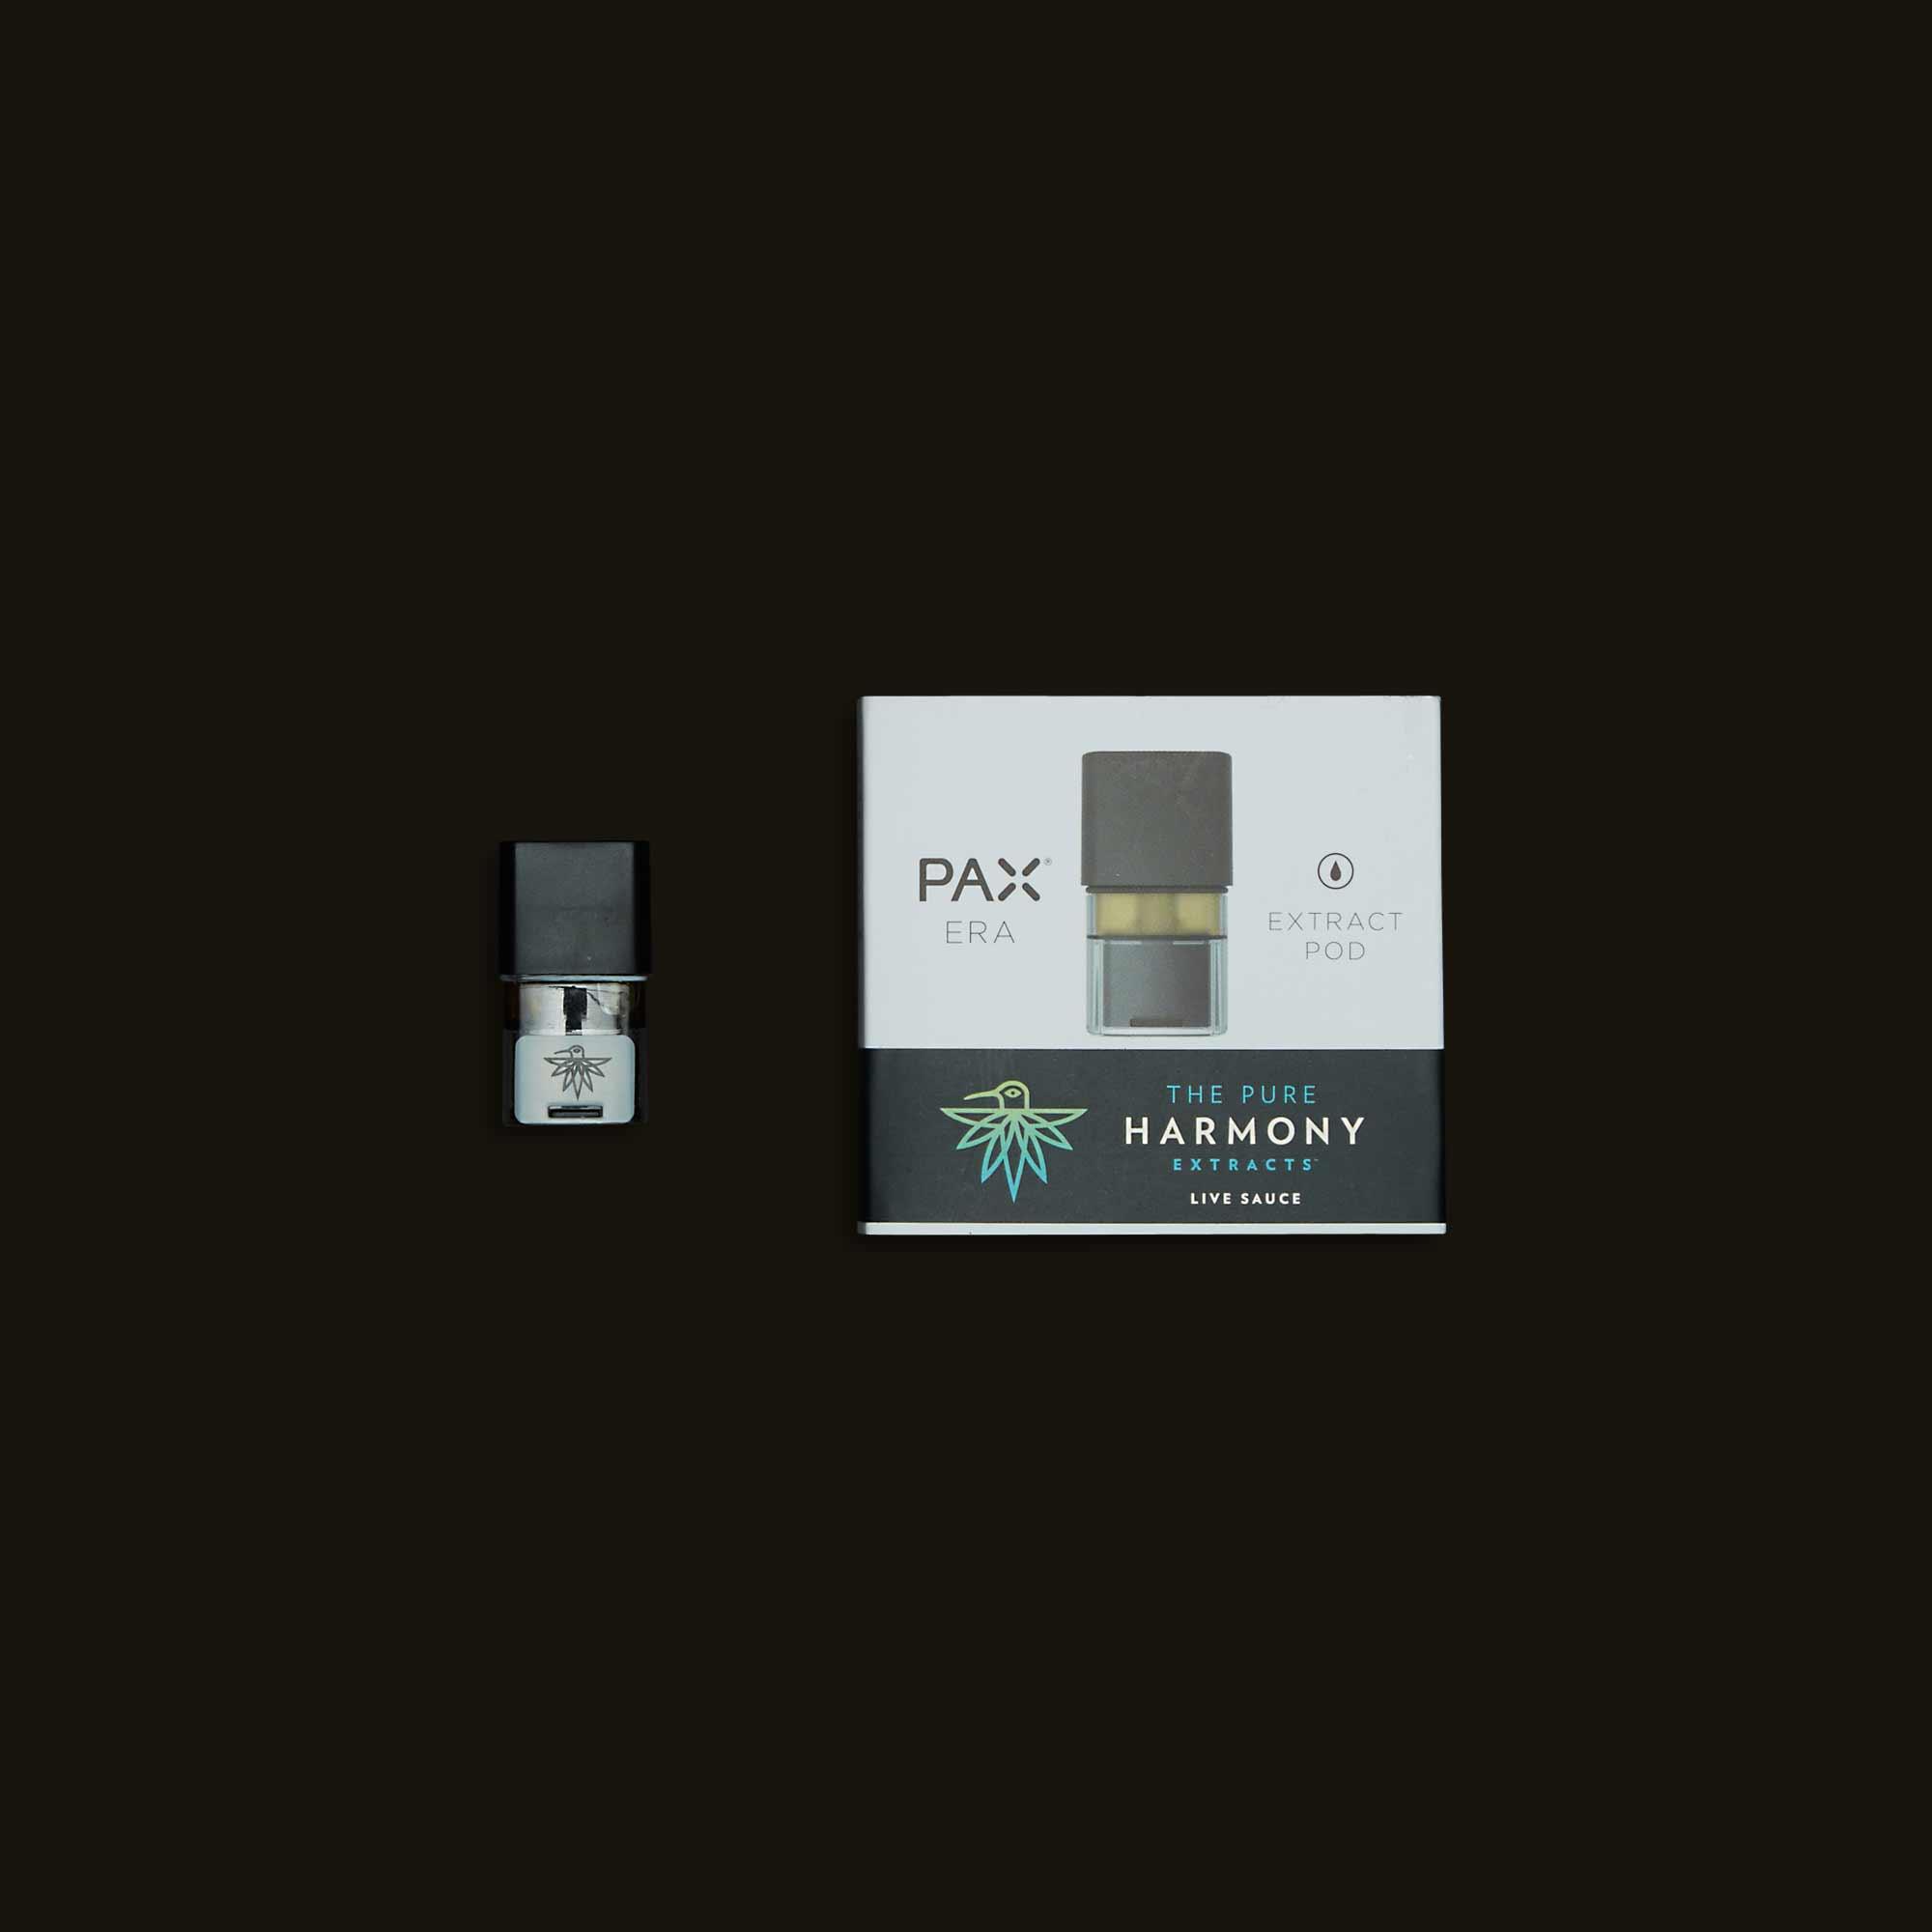 Harmony Extracts Sour Kush Live Sauce PAX Pod